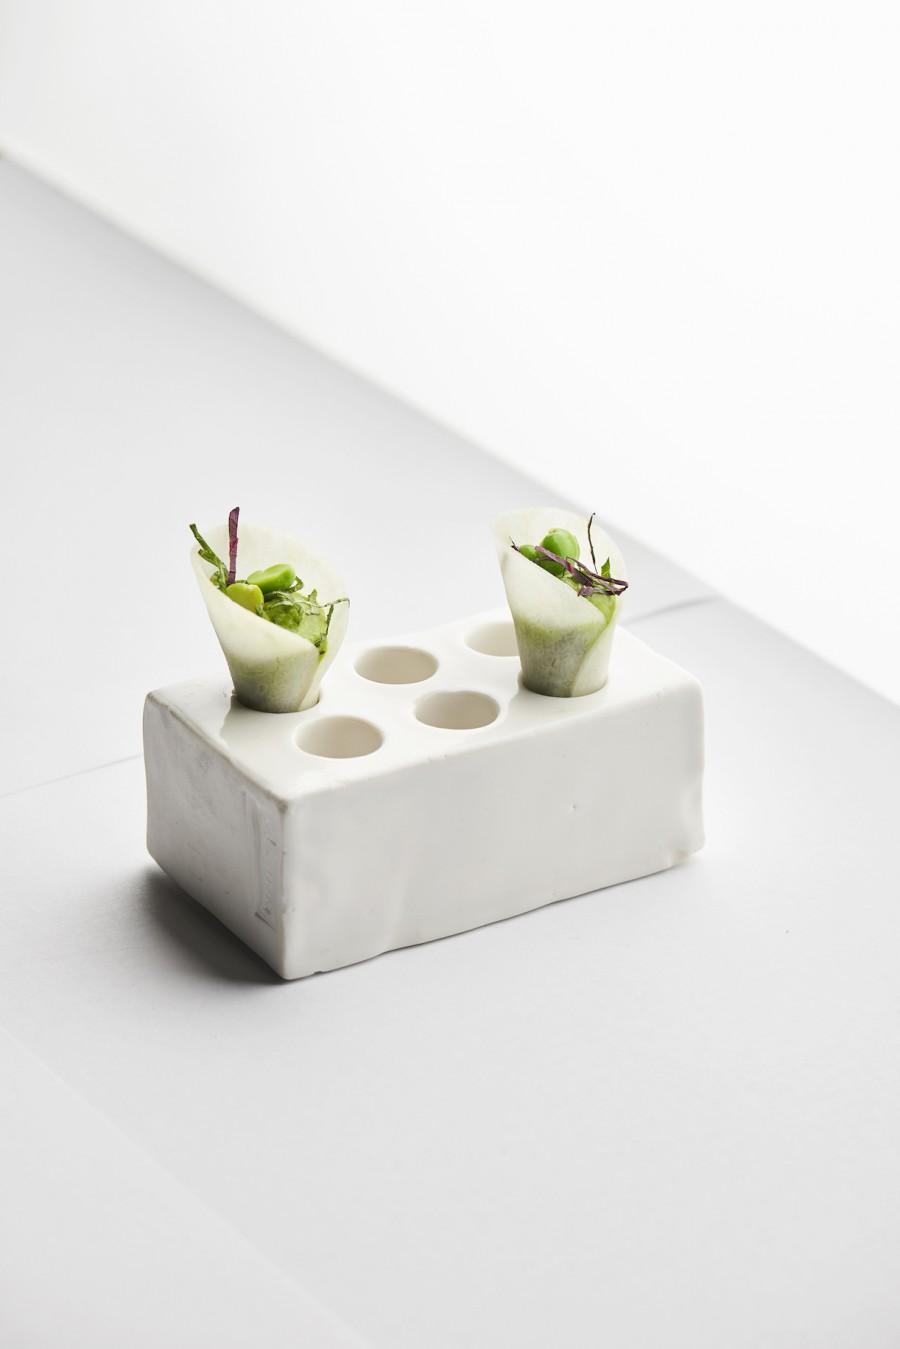 Kohlrabi, peas and shizo. Photography by Fabian Häfeli.